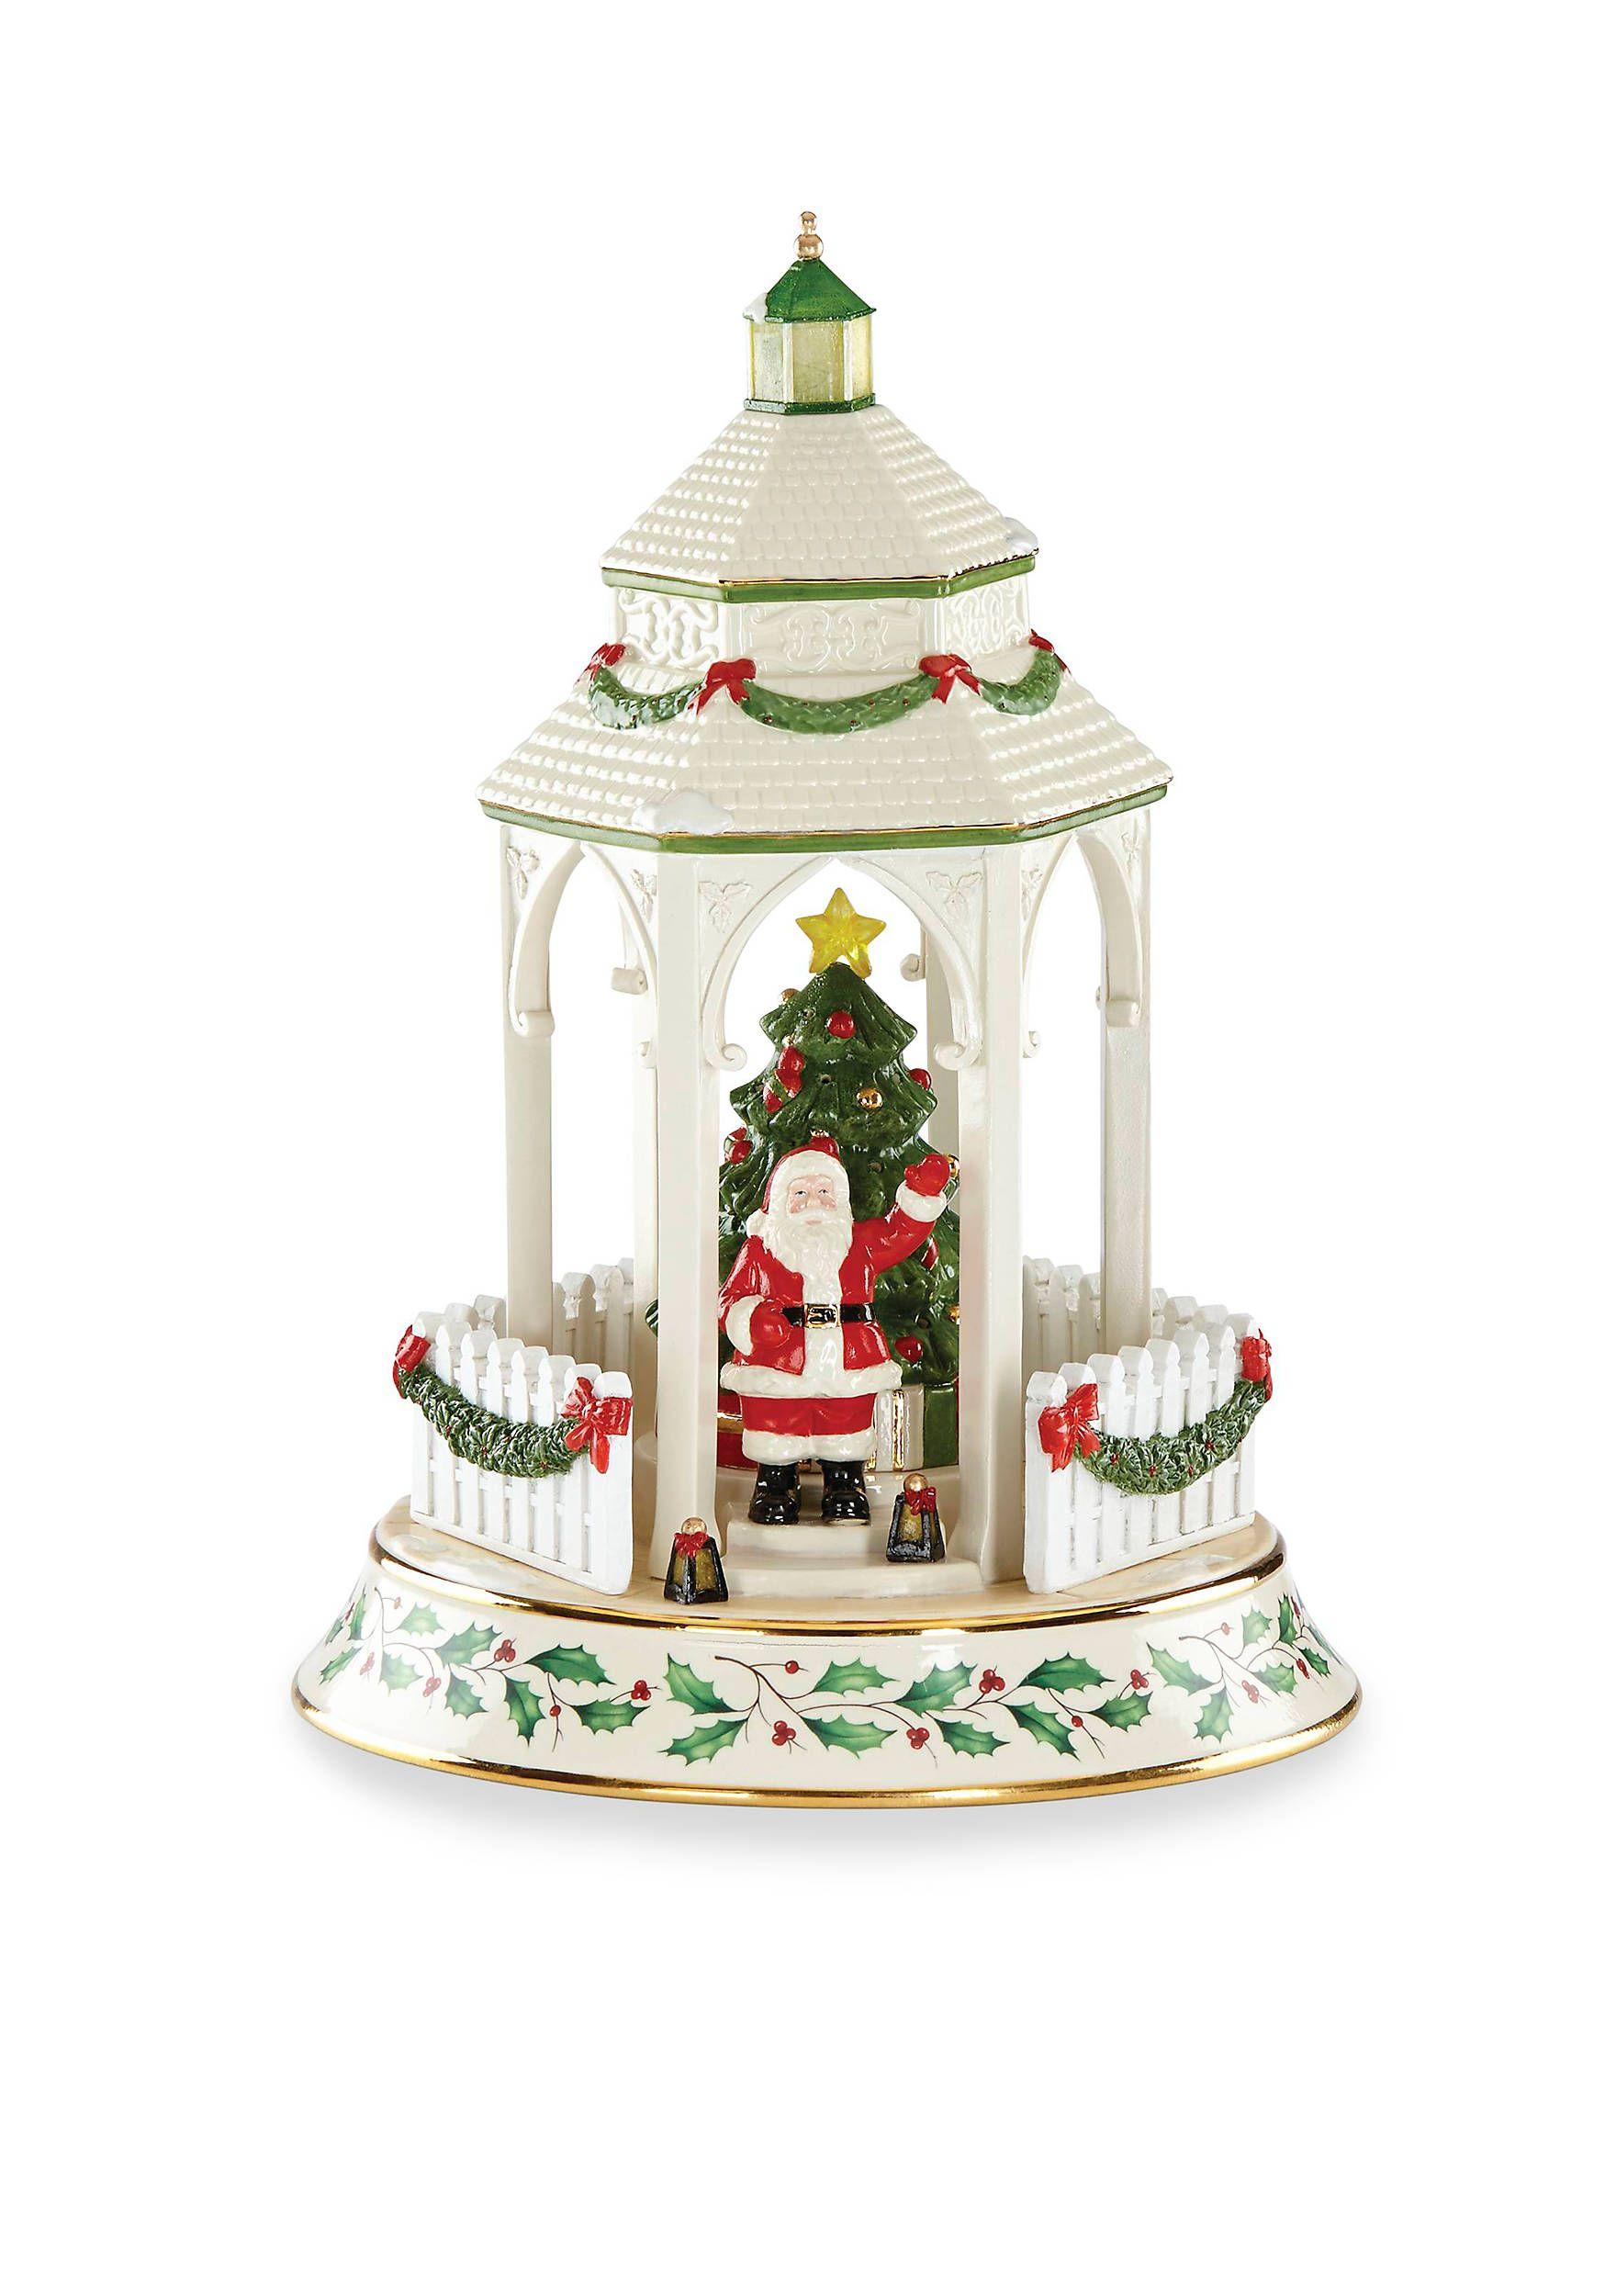 lenox 2017 holiday town gazebo centerpiece holiday dinnerware